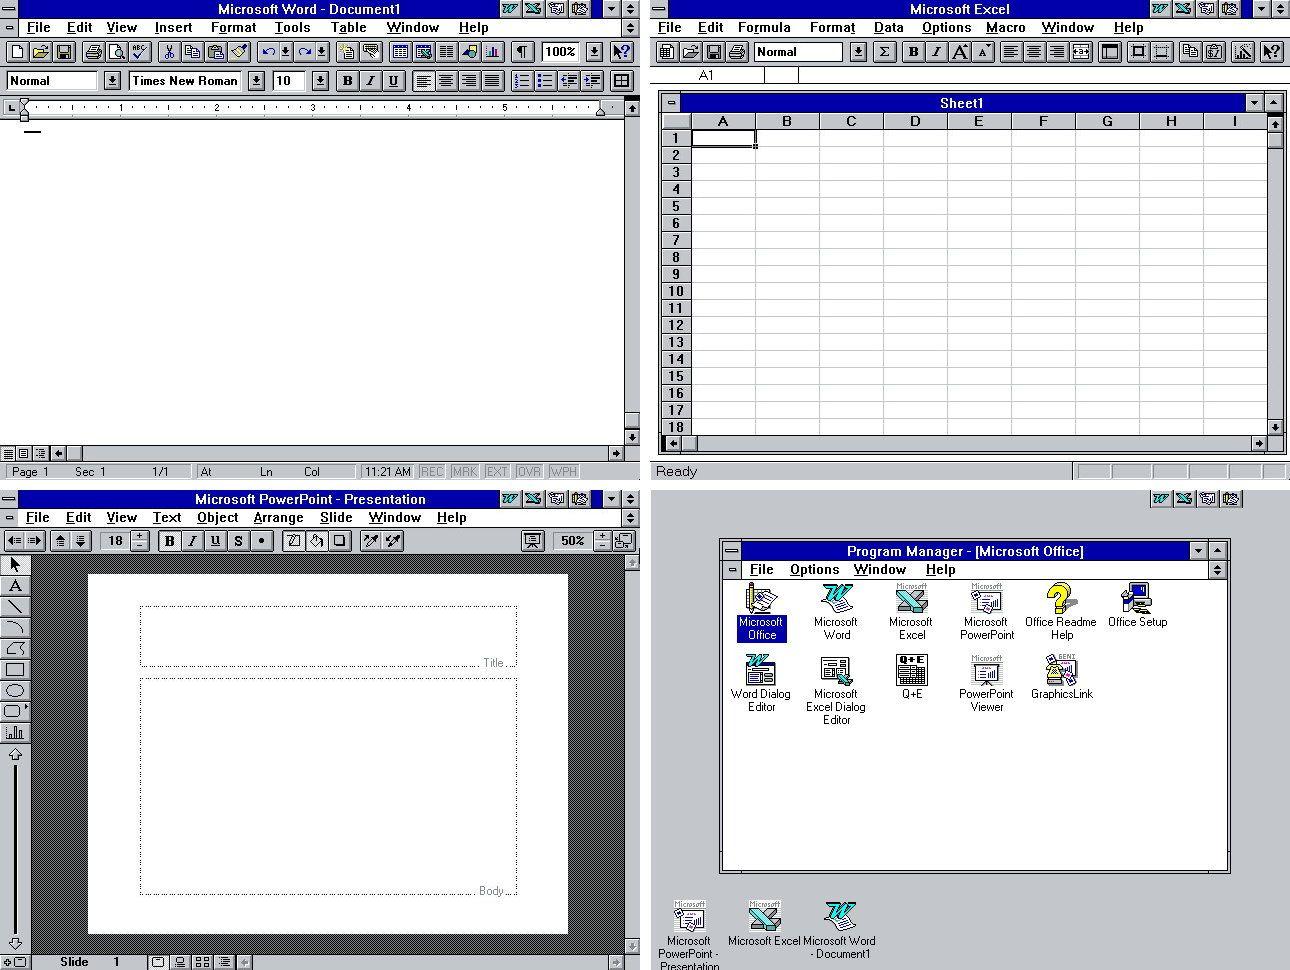 Microsoft office history vers since 10 19901119 via